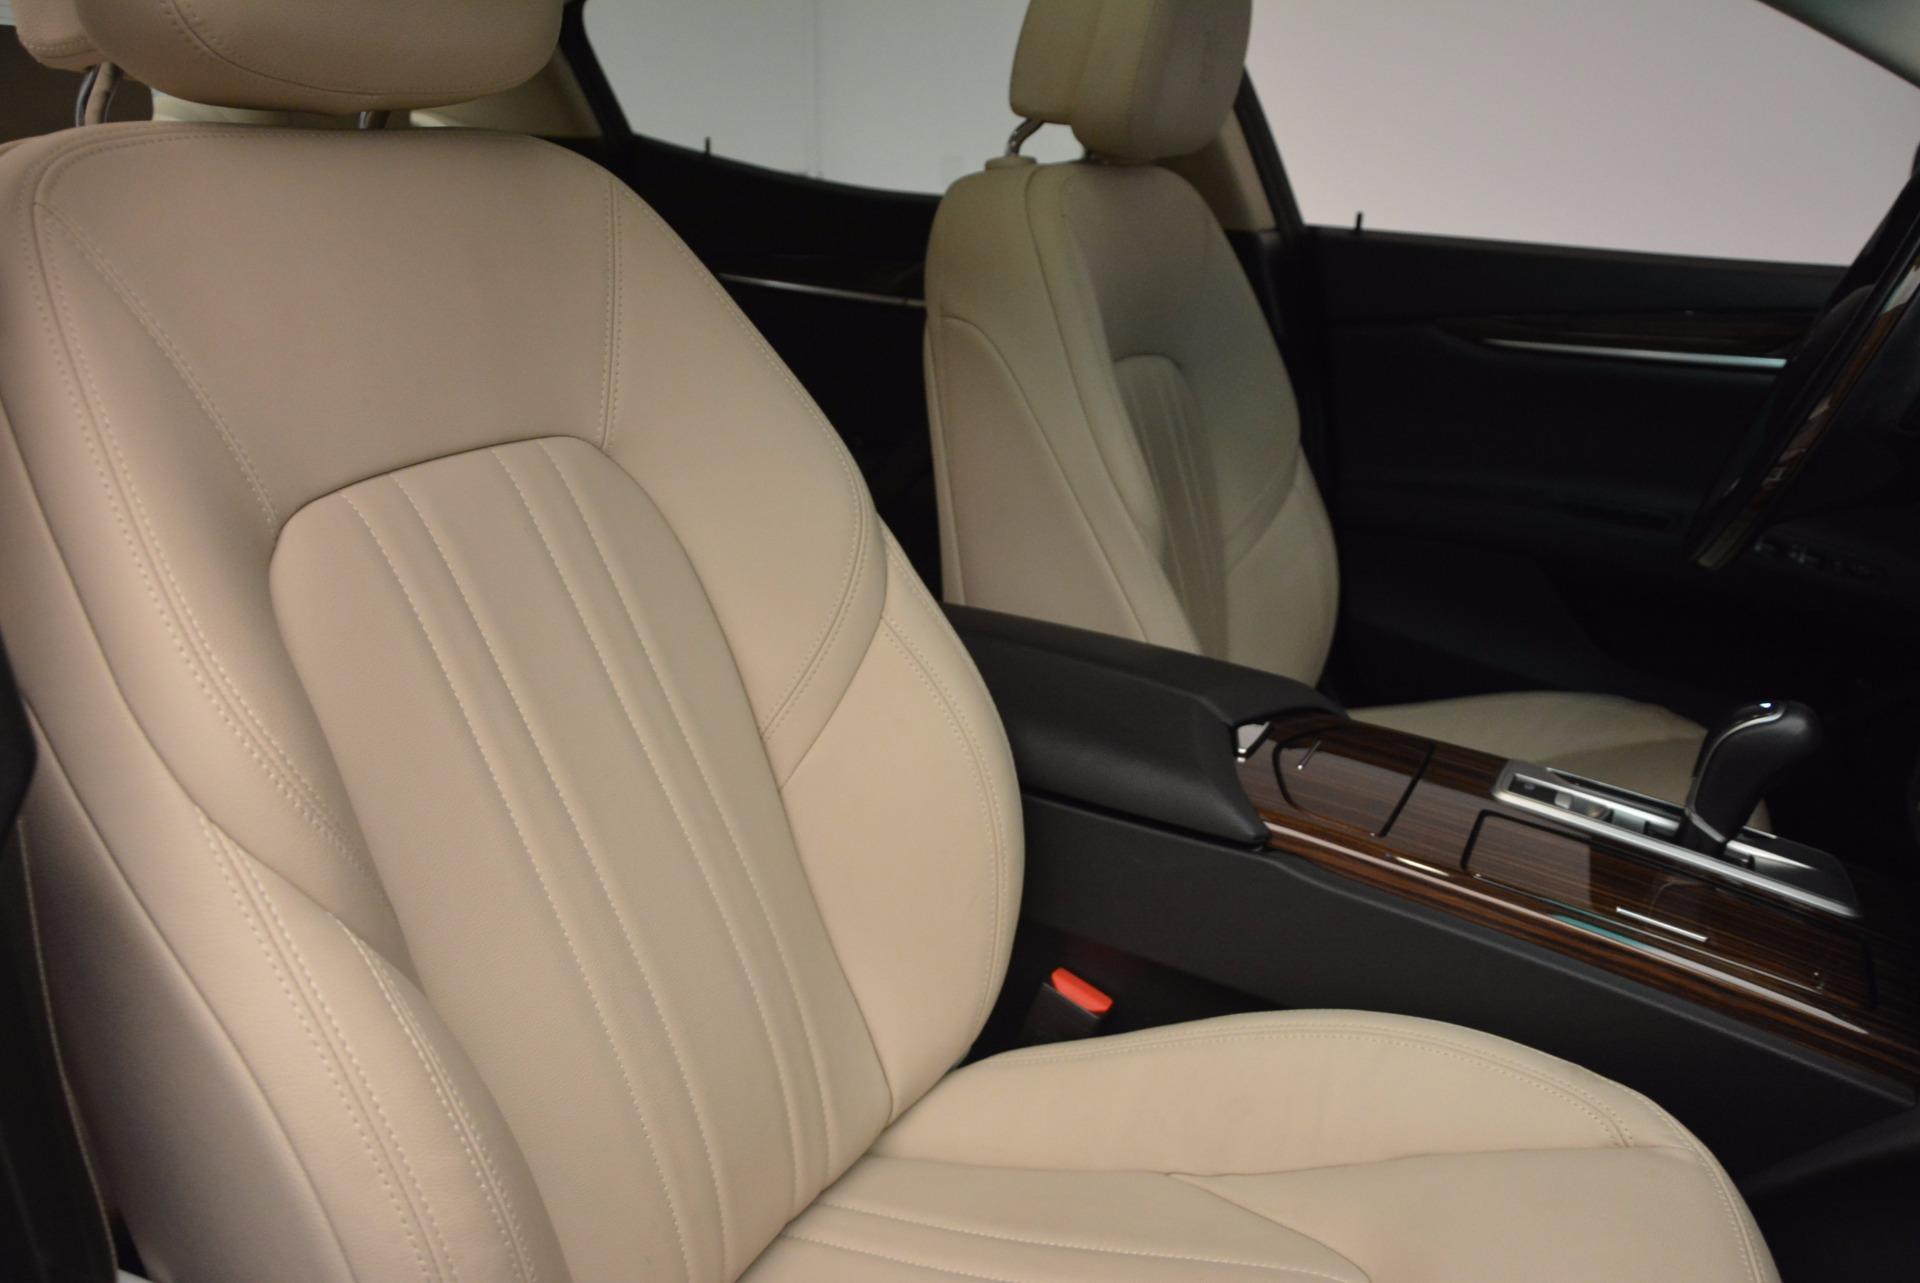 Used 2015 Maserati Ghibli S Q4 For Sale In Greenwich, CT 1059_p21